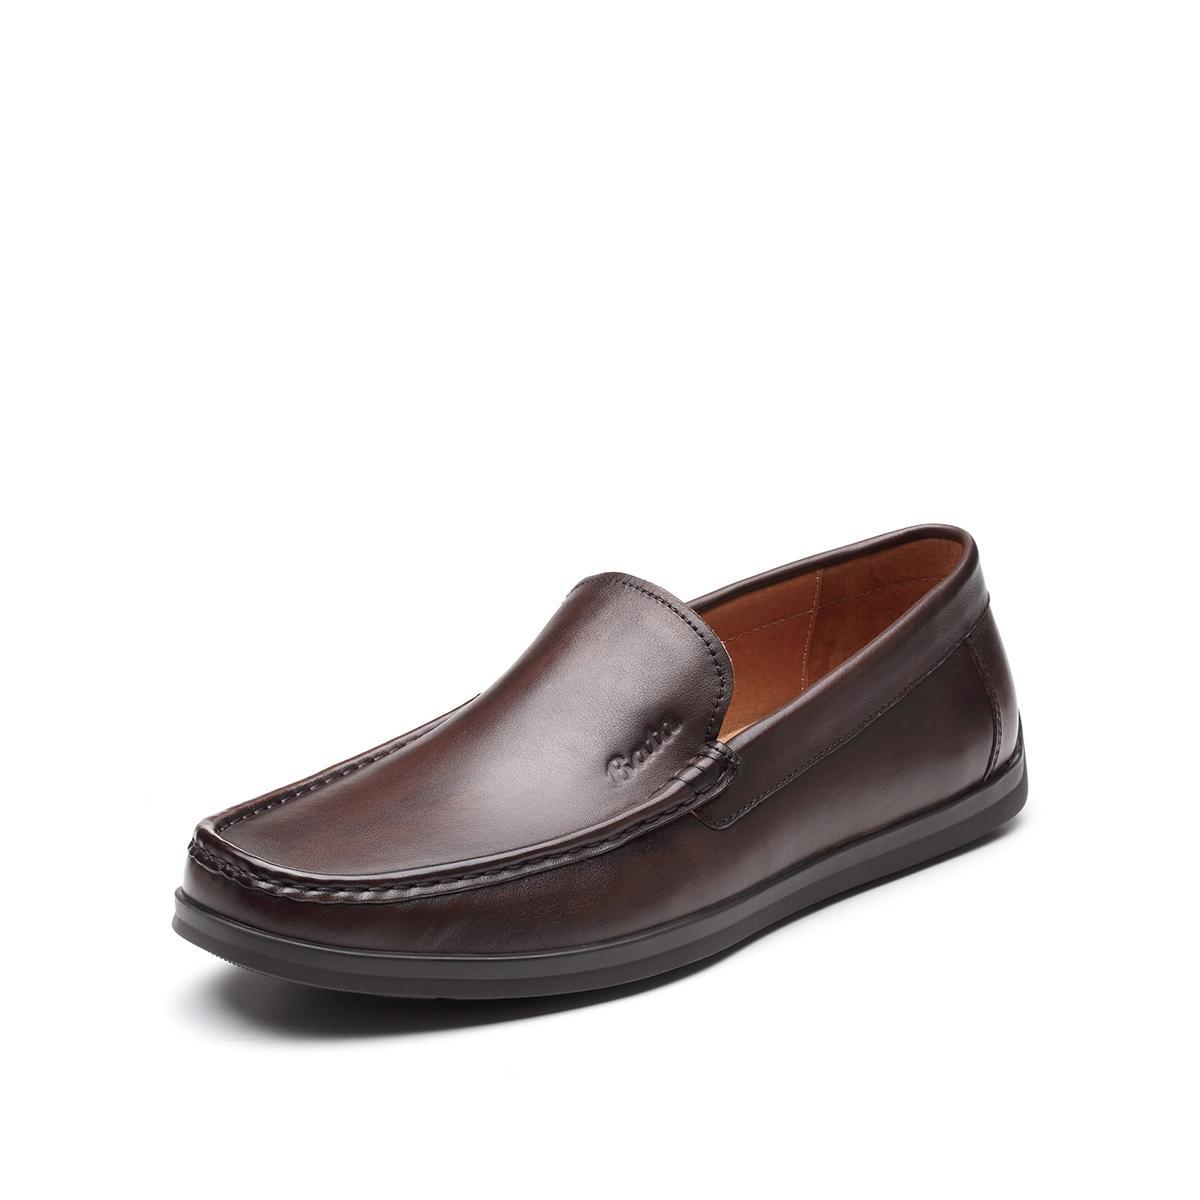 Bata 拔佳2019新款专柜同款牛皮鞋纯色懒人一脚蹬平底男鞋